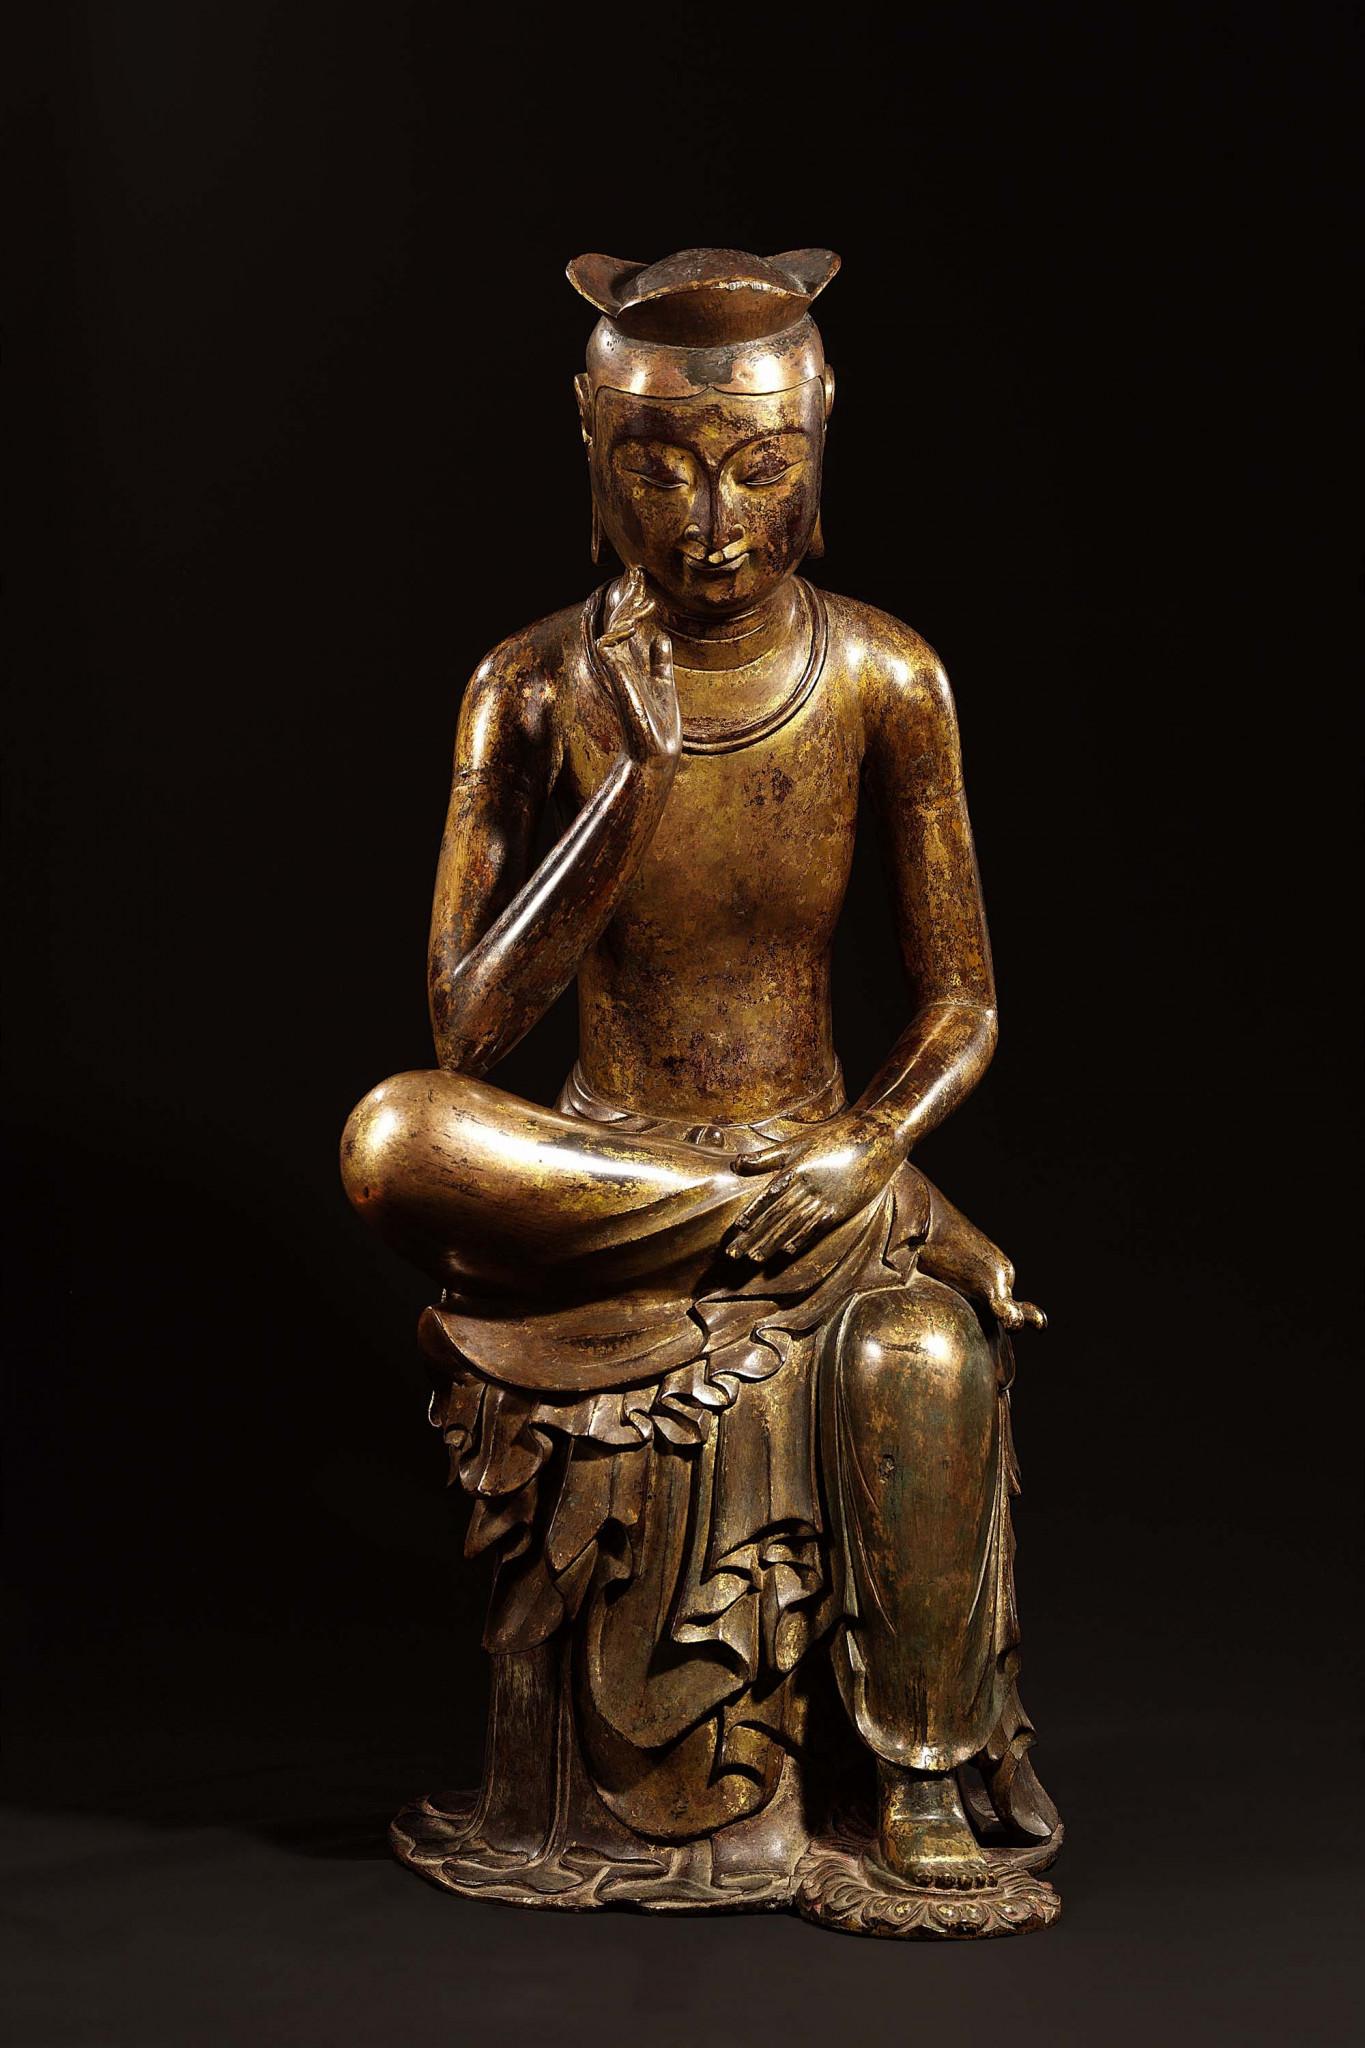 Contemplative Bodhisattva